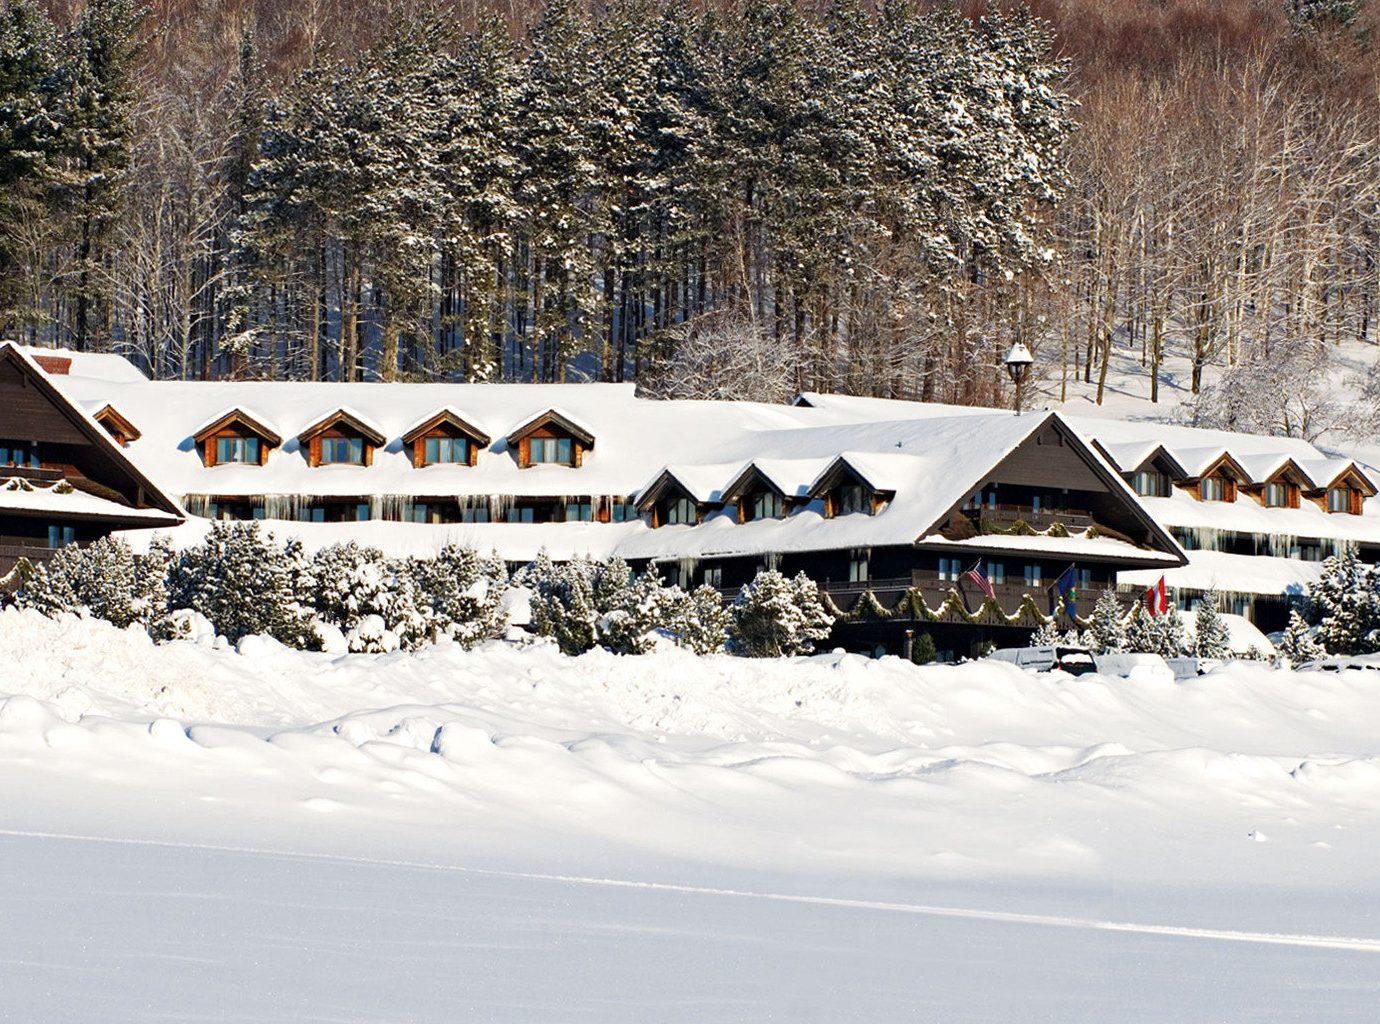 Country Family Lodge Mountains Outdoors Ski snow Winter weather season geological phenomenon vehicle winter sport